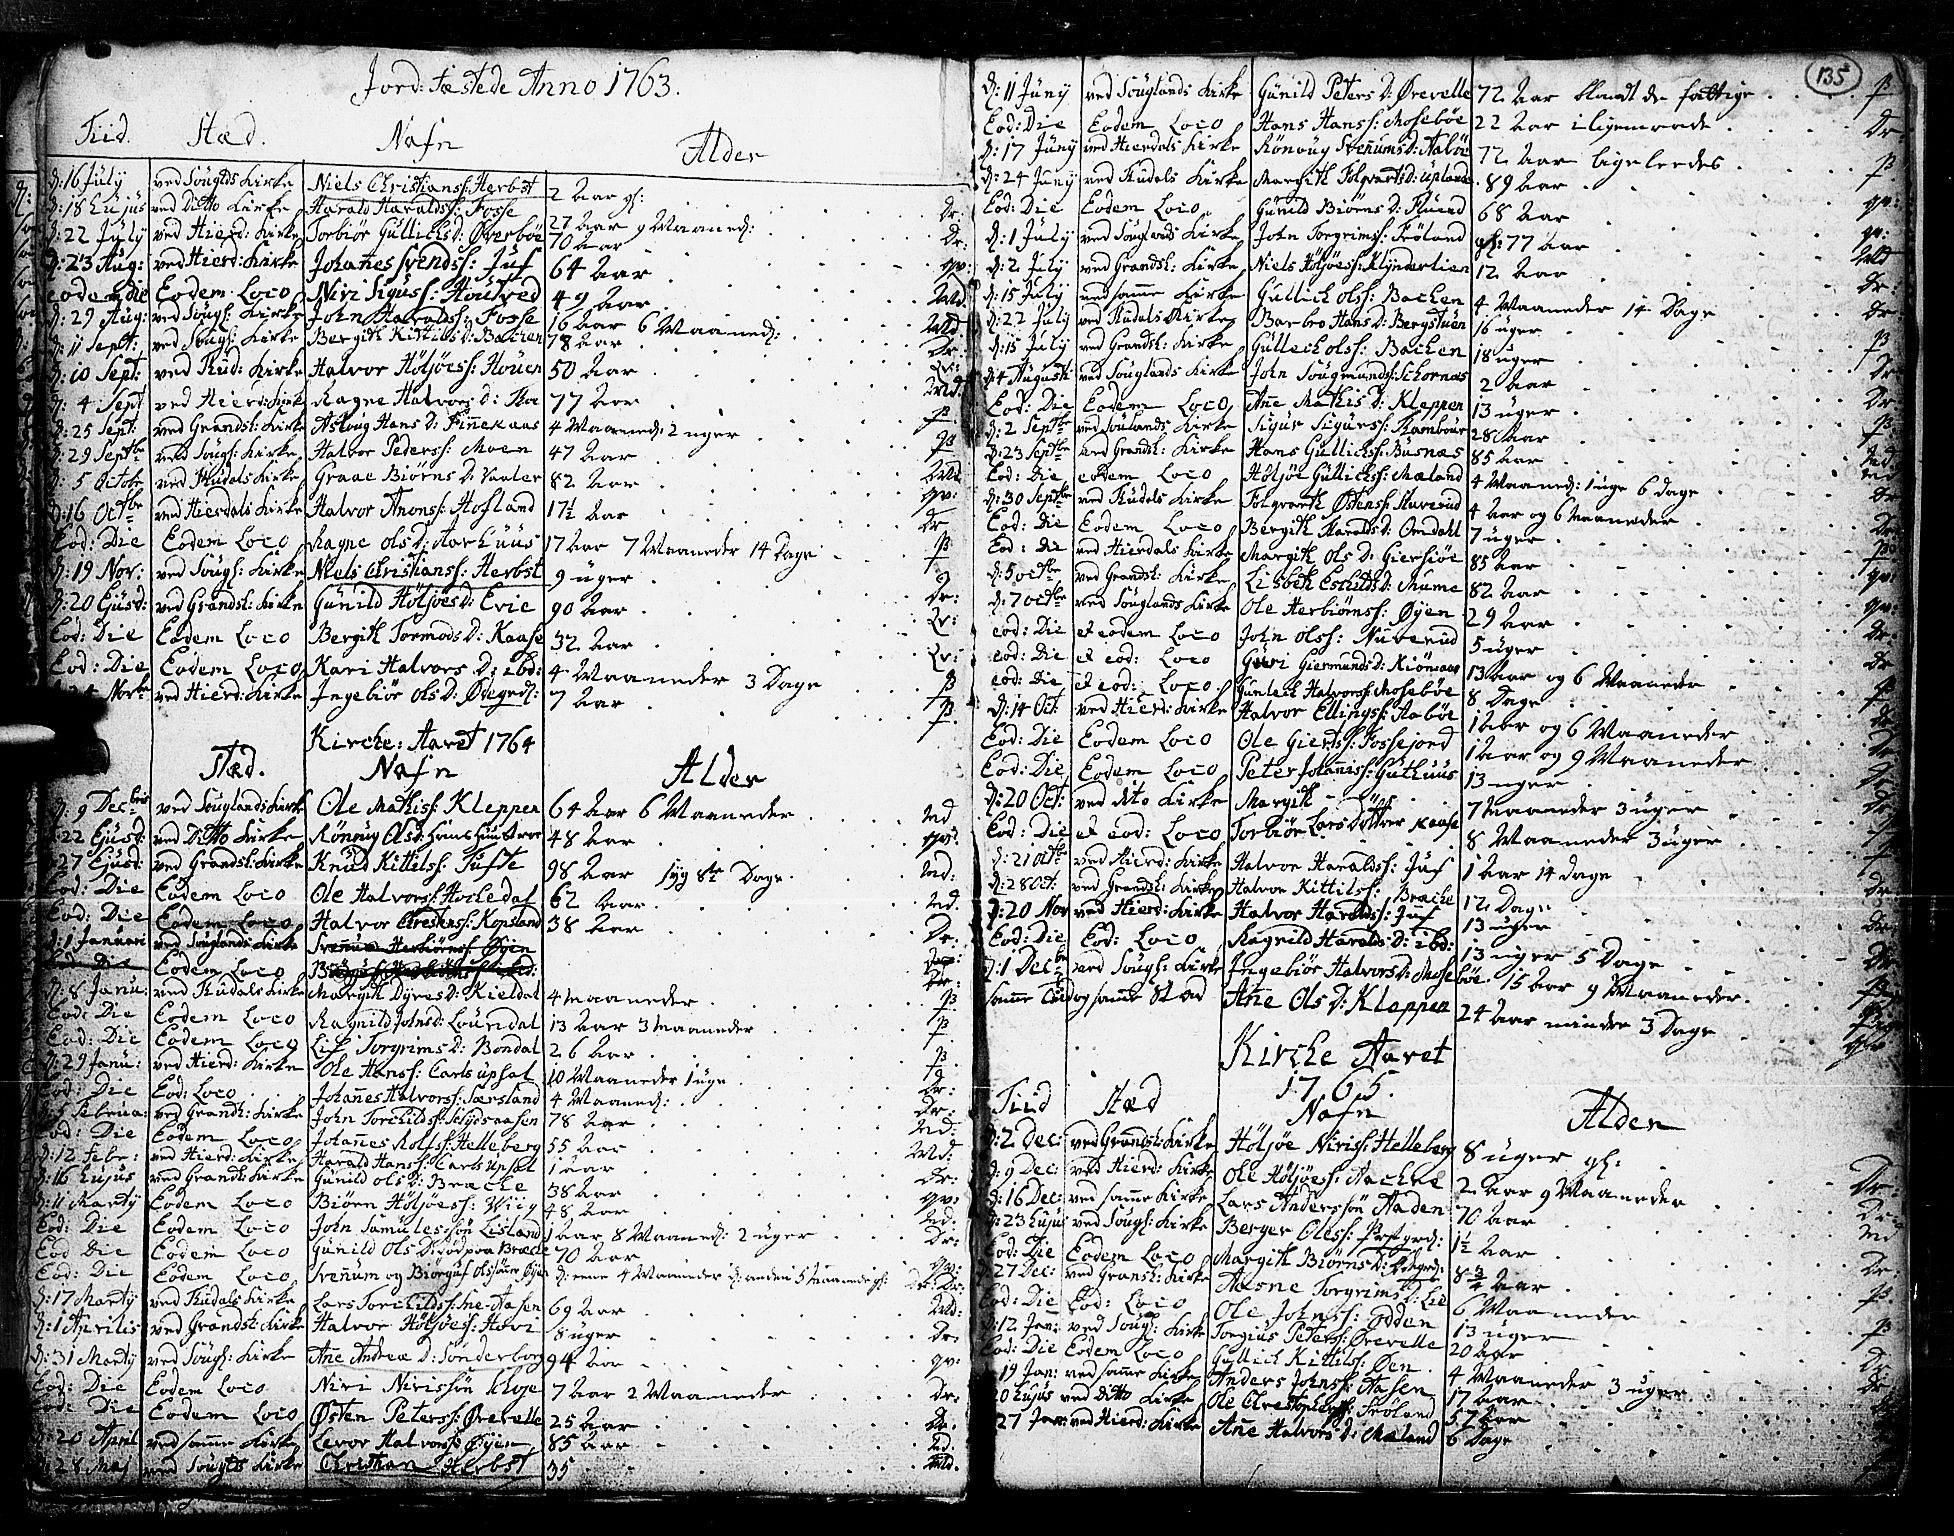 SAKO, Hjartdal kirkebøker, F/Fa/L0003: Ministerialbok nr. I 3, 1727-1775, s. 135